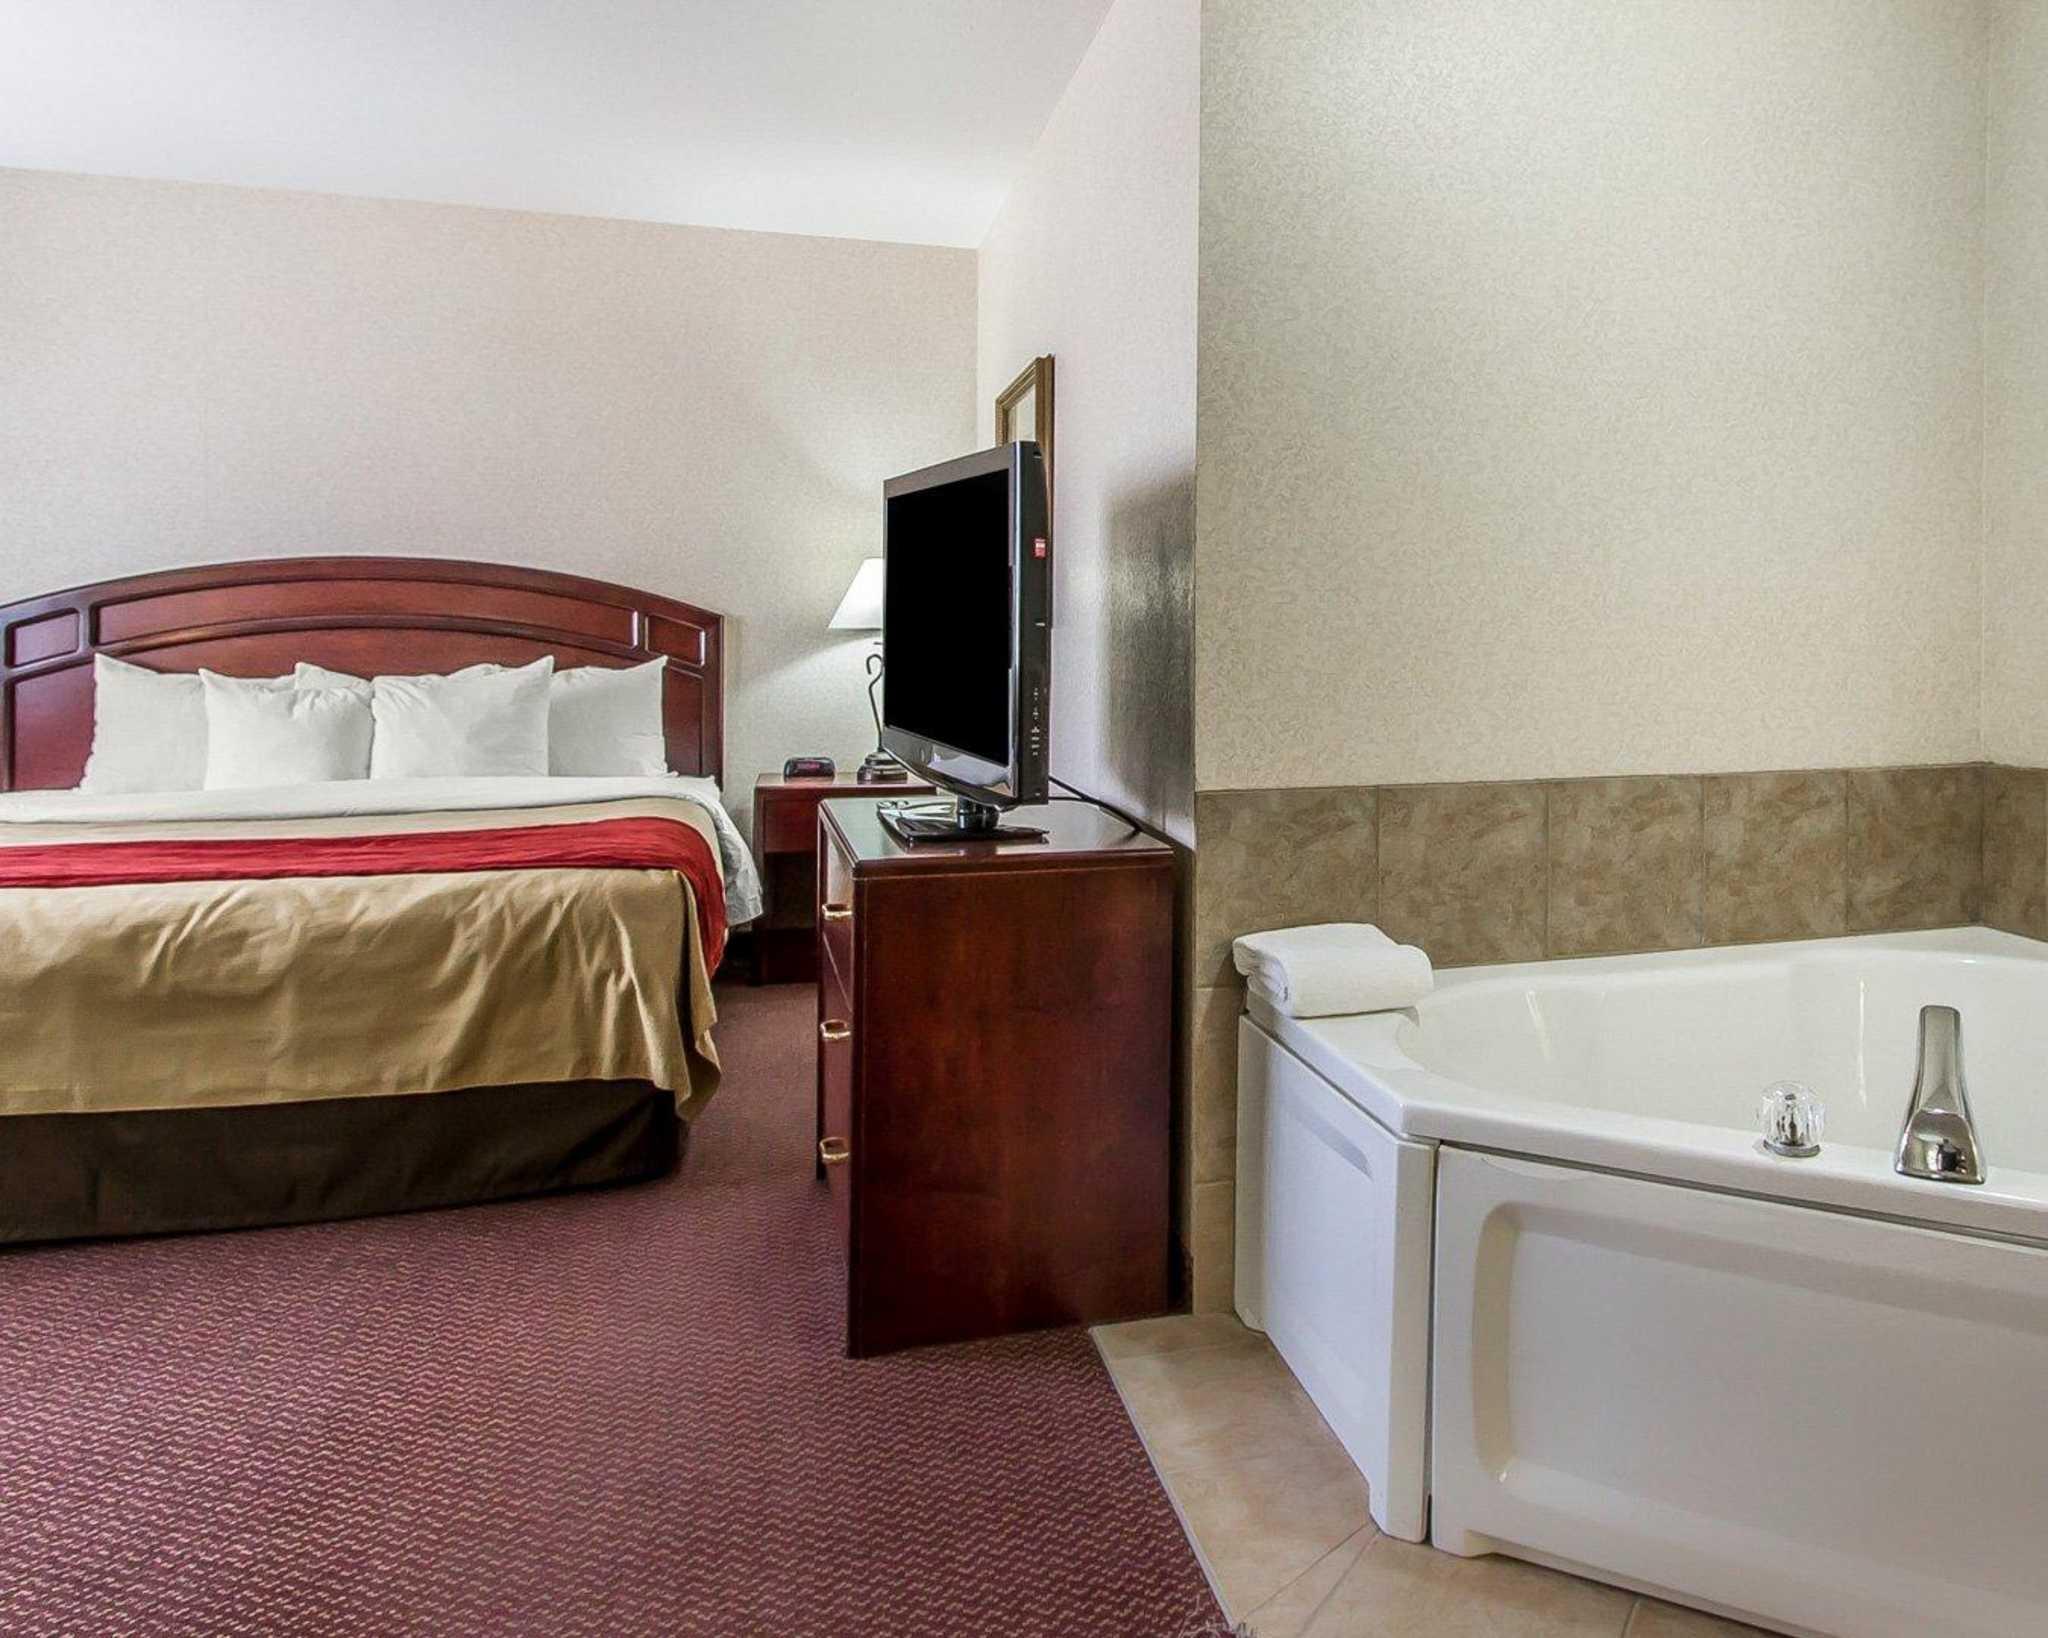 Quality Inn & Suites image 10